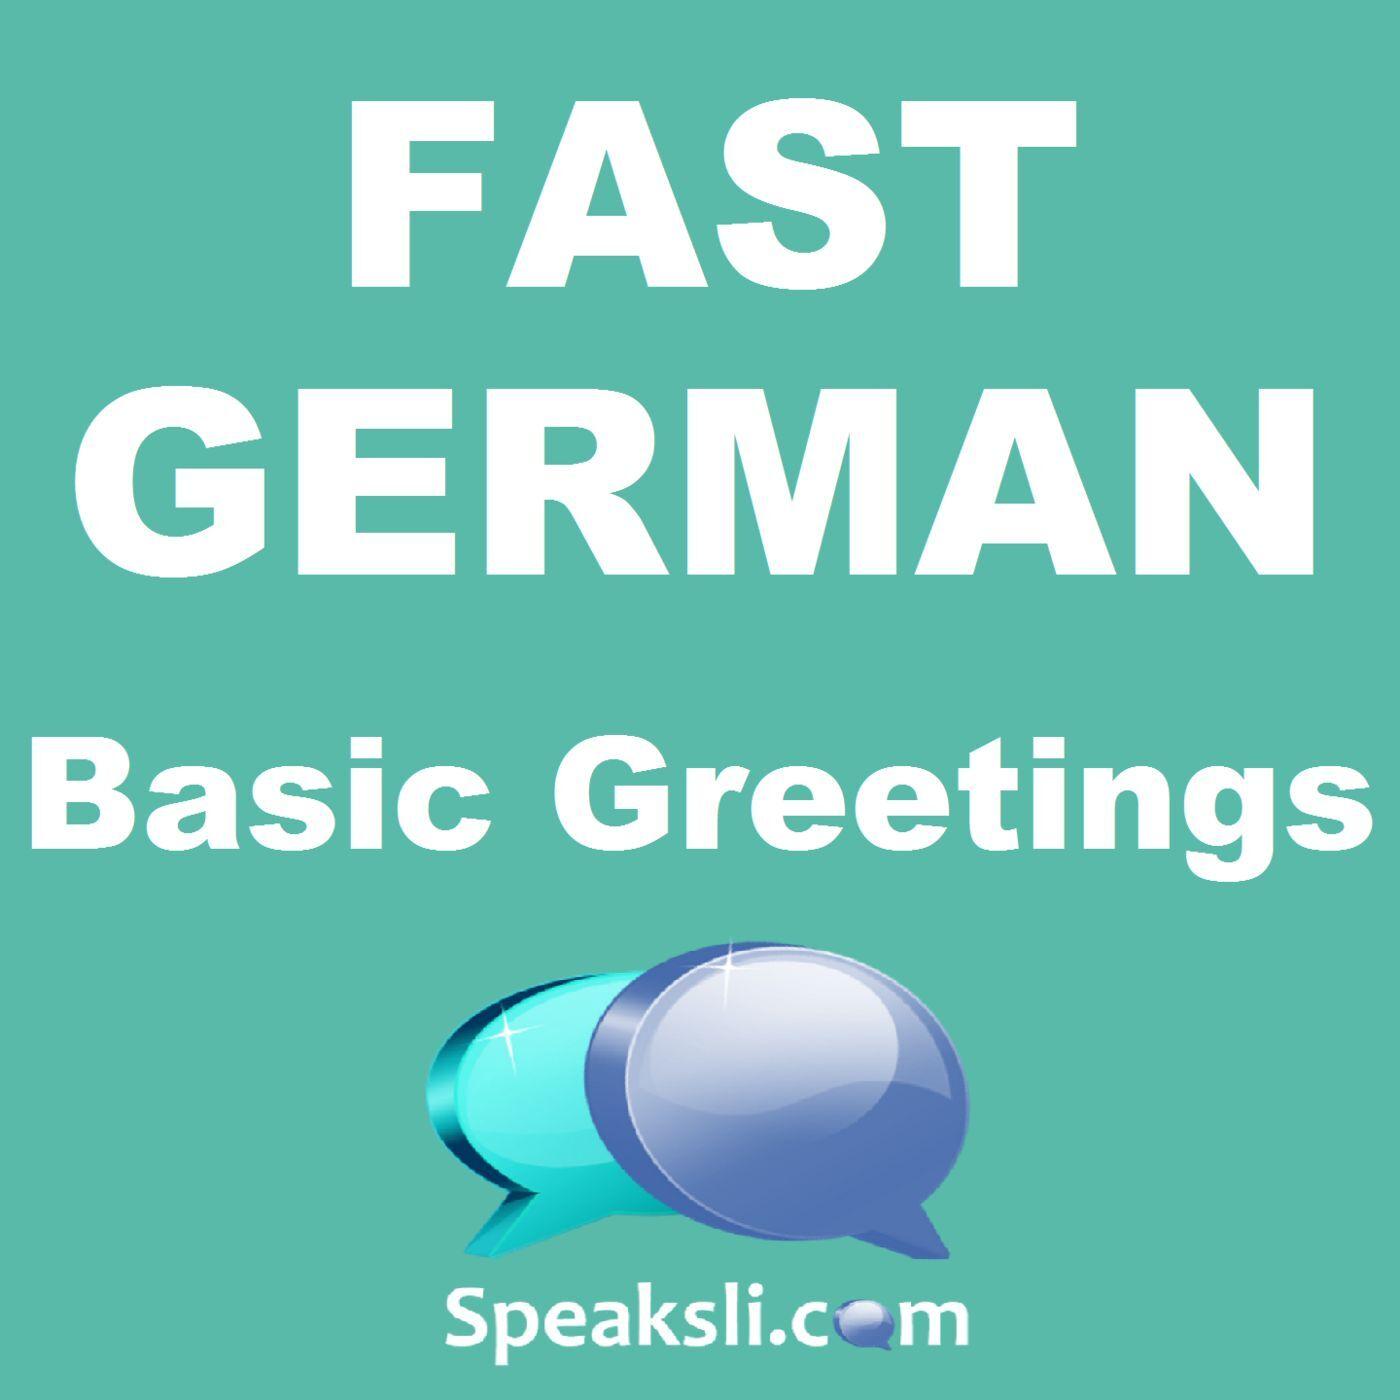 Fast german ep 1 basic greetings fast german speaksli m4hsunfo